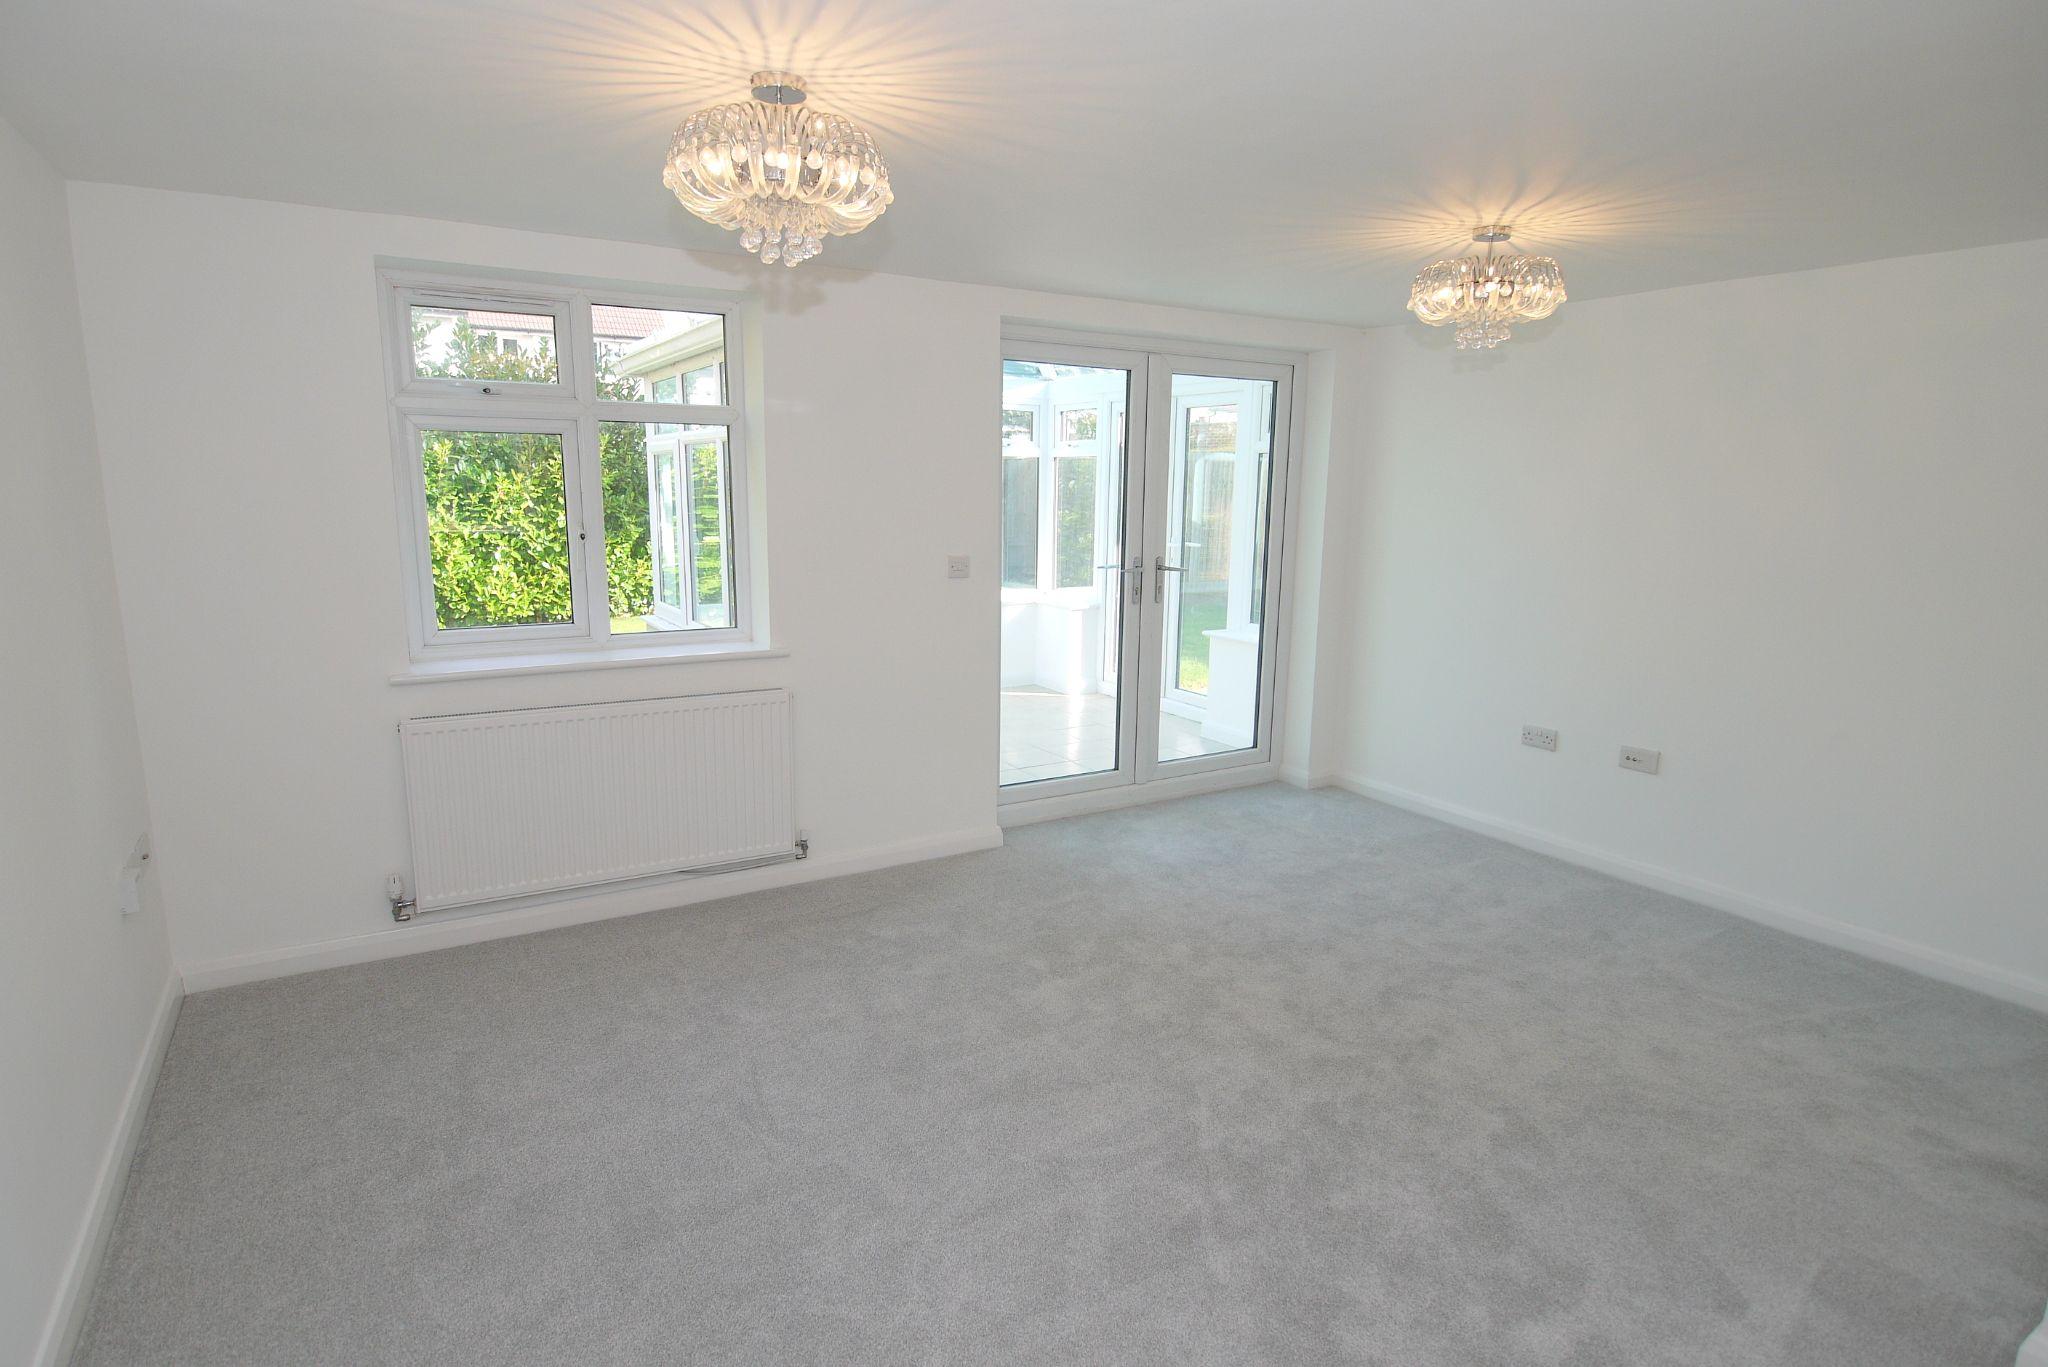 3 bedroom detached house Sold in Sevenoaks - Photograph 6